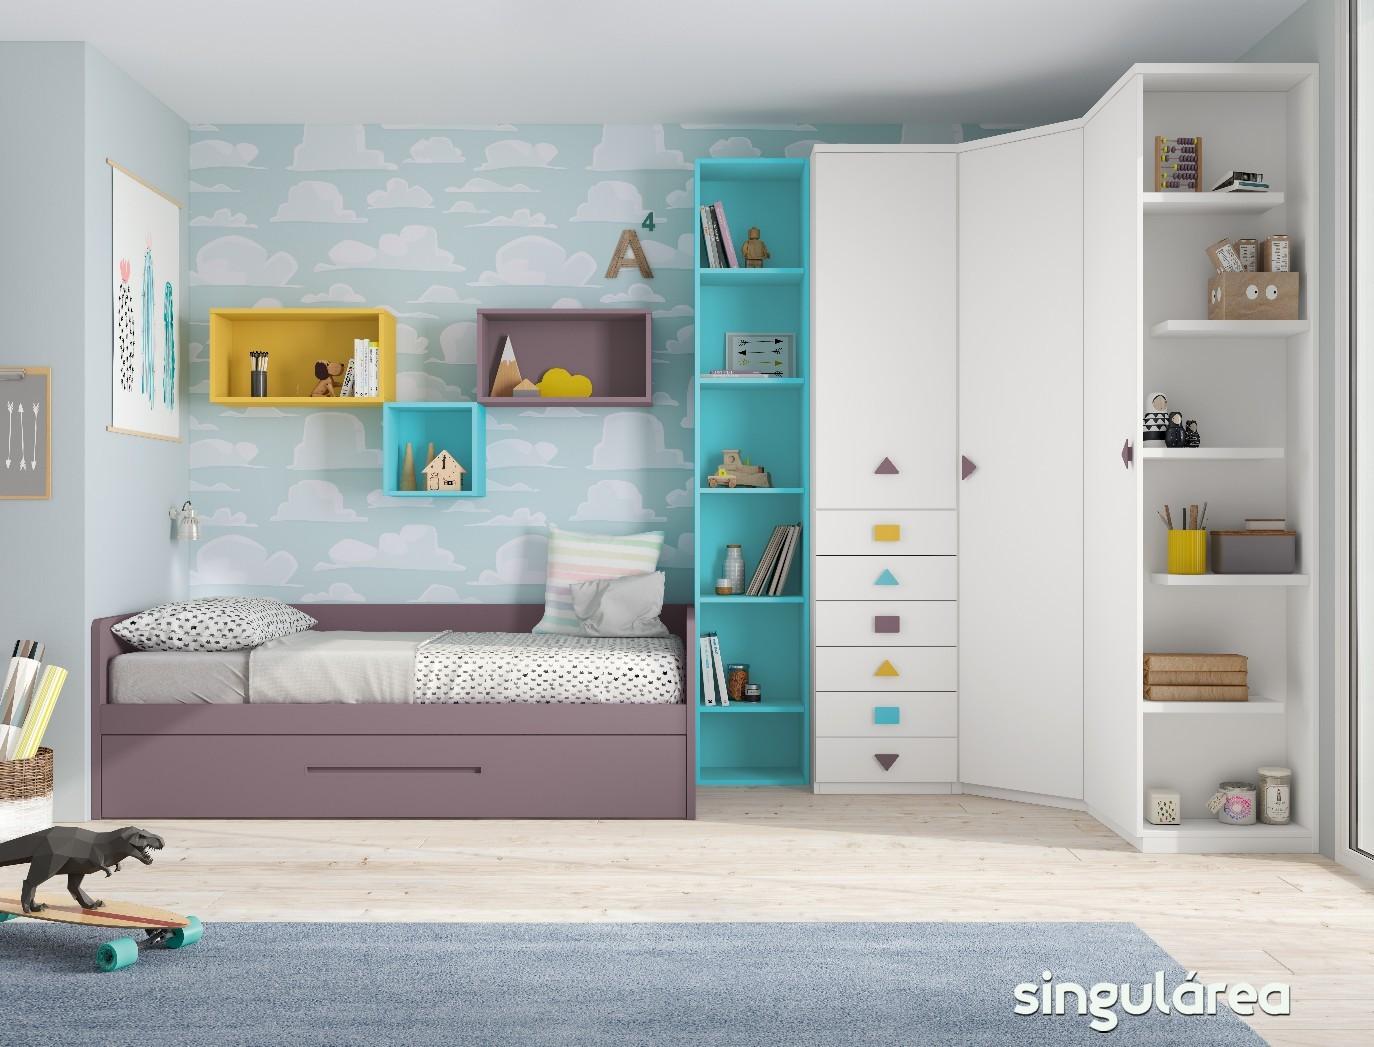 blog dormitorios juveniles com novedades camas nido para On dormitorios infantiles modernos